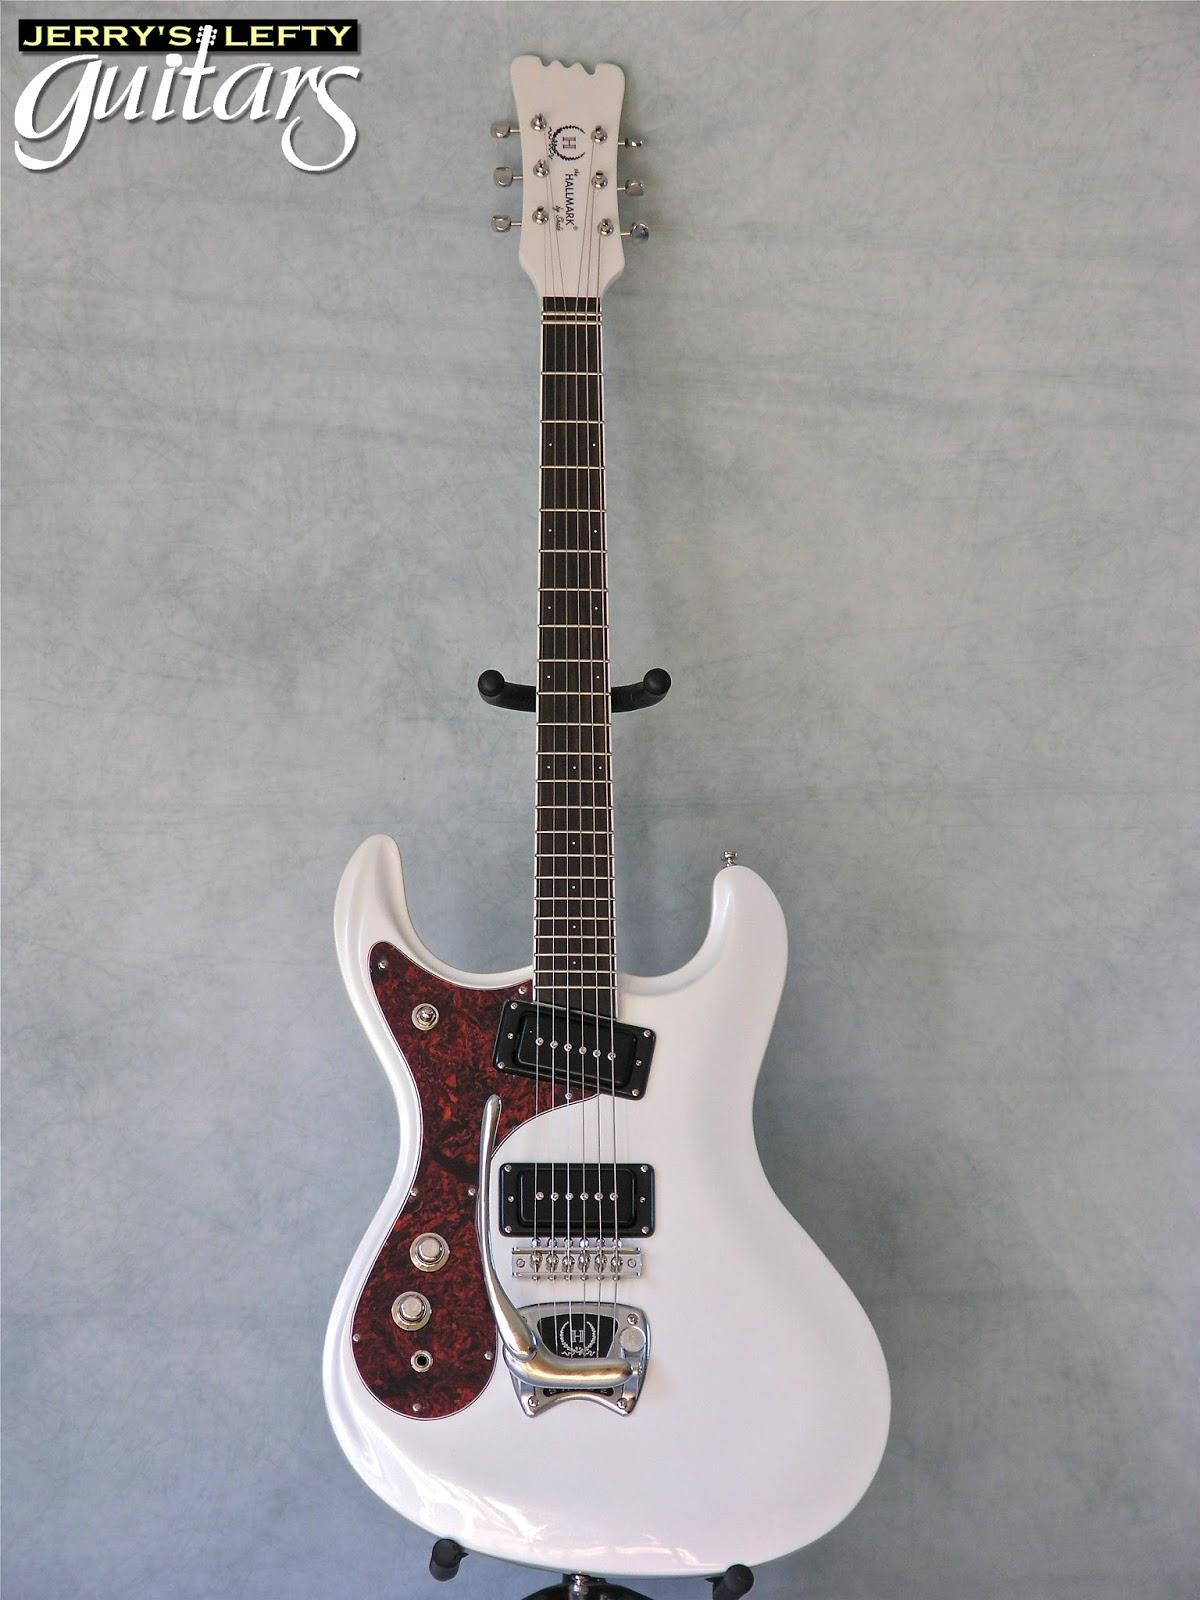 jerry 39 s lefty guitars newest guitar arrivals updated weekly hallmark 60 custom left handed. Black Bedroom Furniture Sets. Home Design Ideas